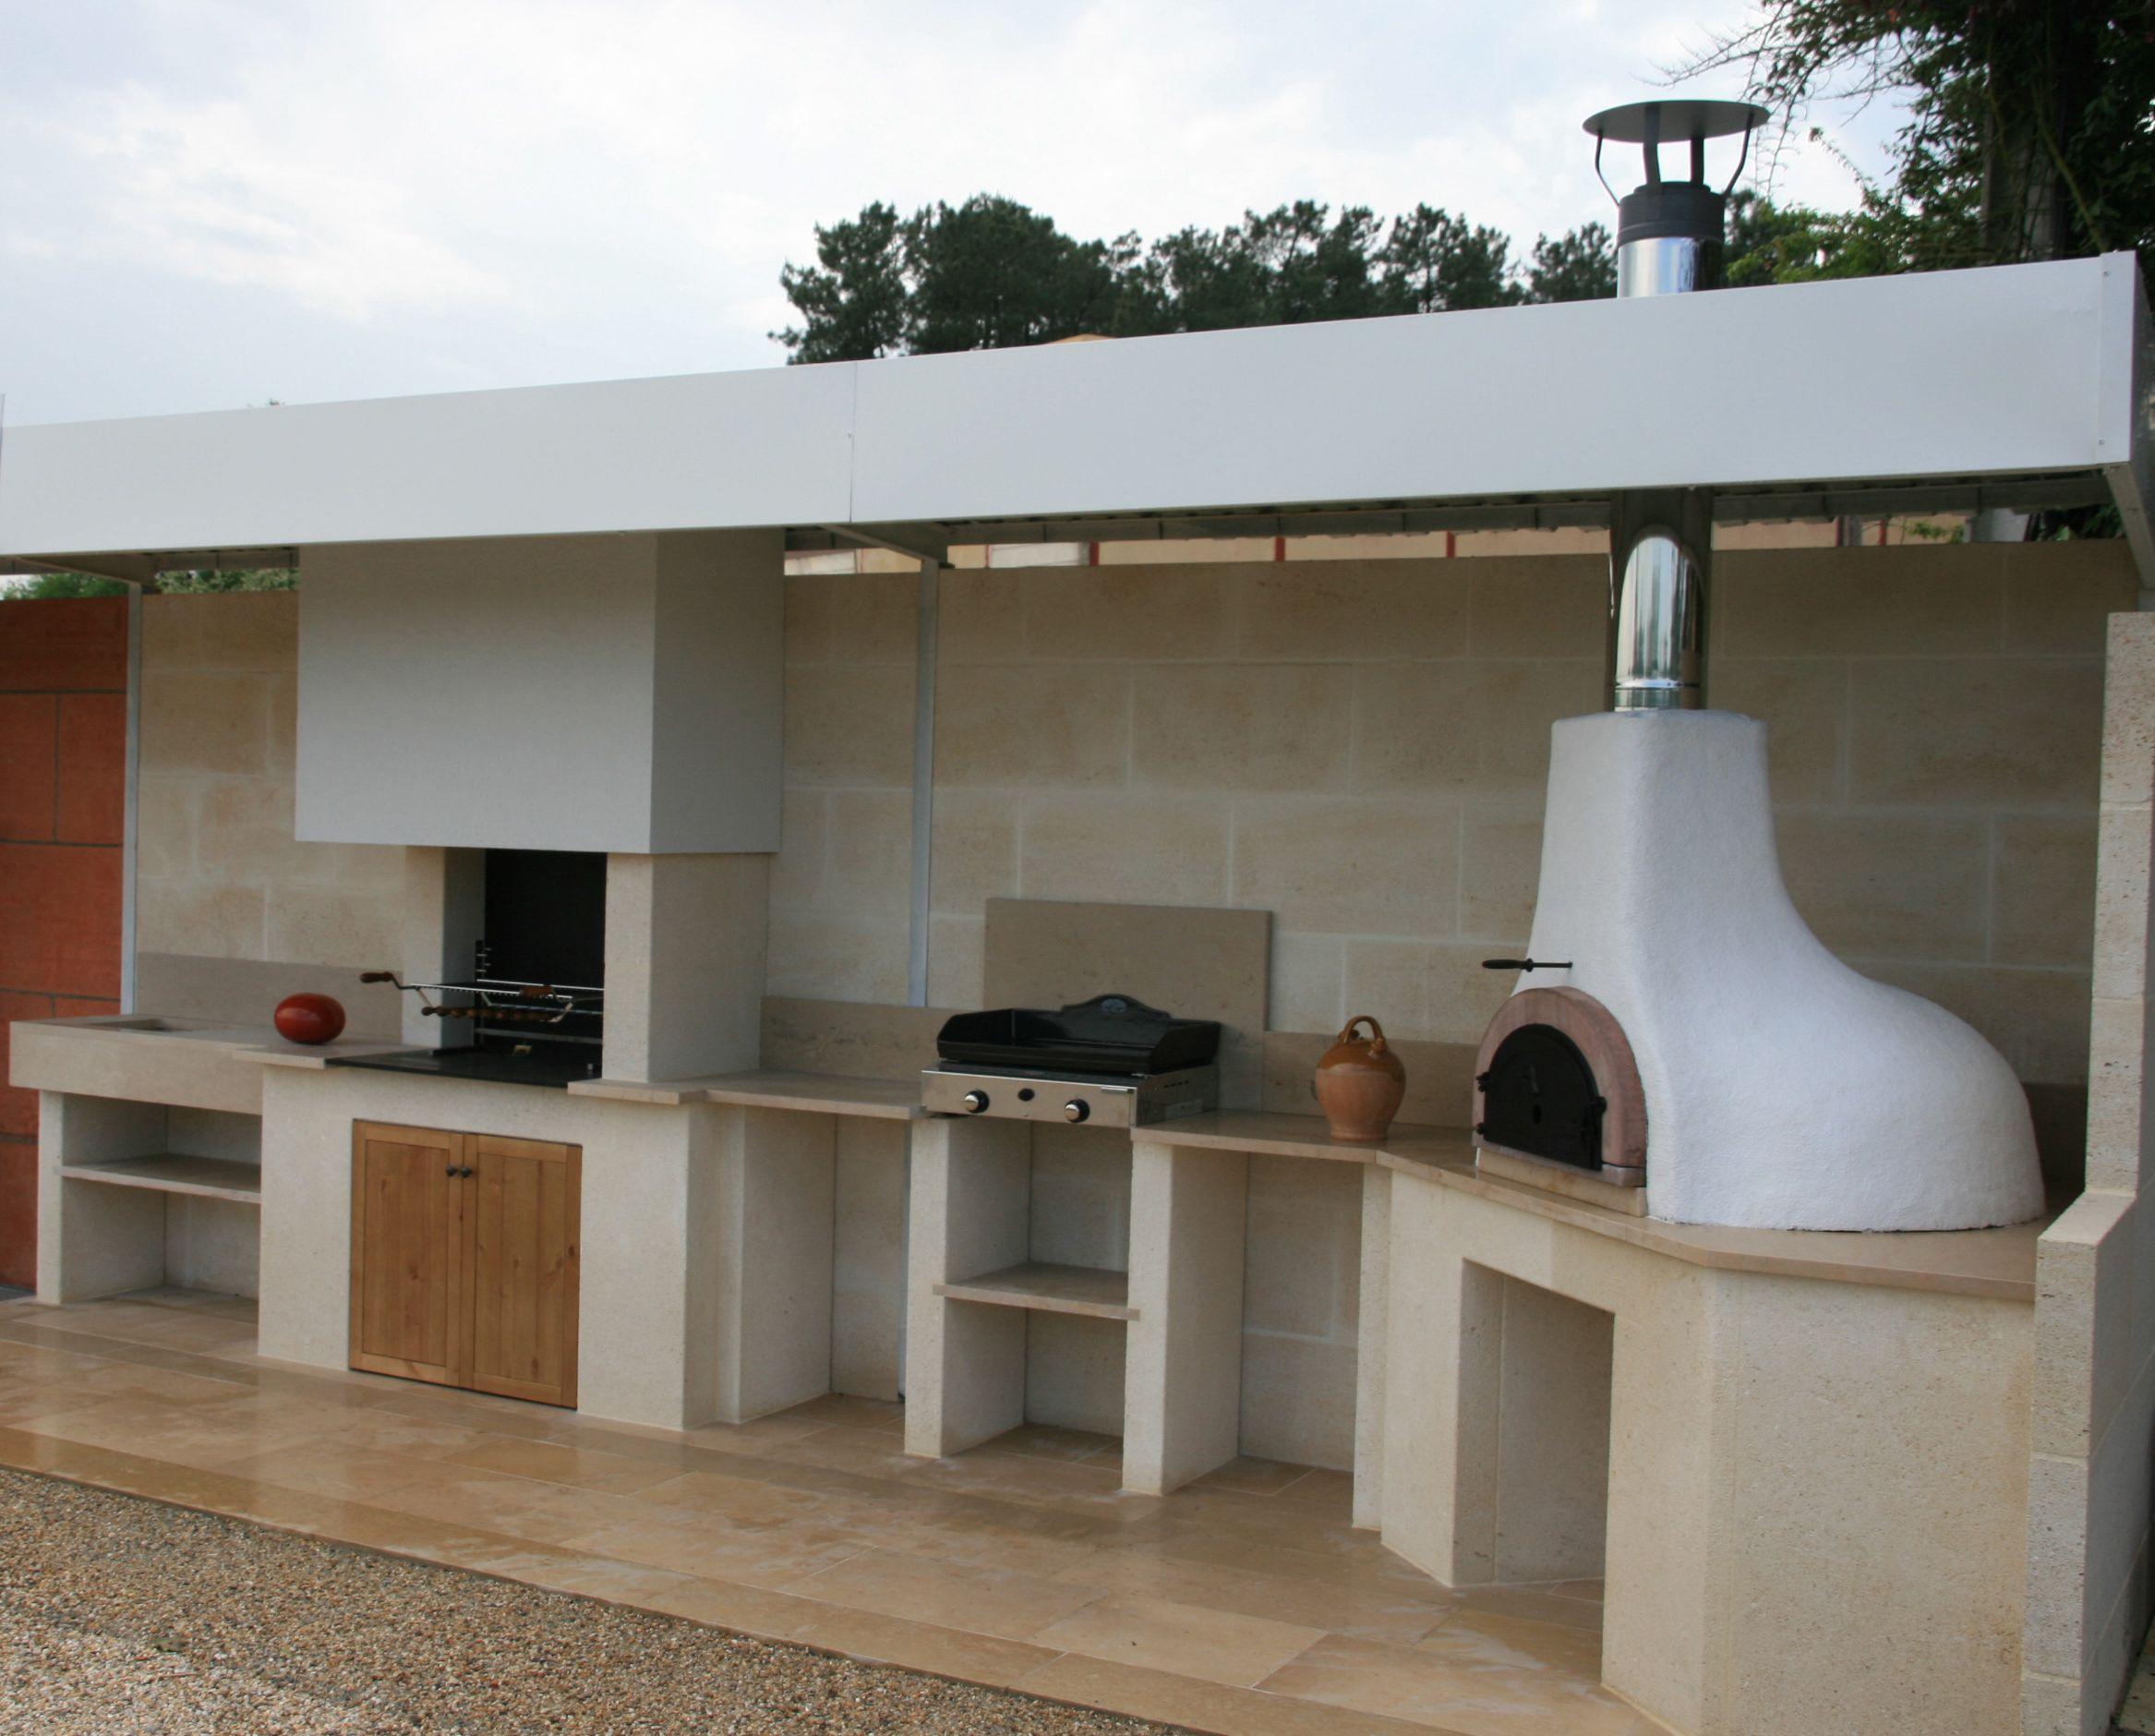 Ensemble-Cuisson-Four-Plancha-Barbecue-Evier.jpg (2334×1880 ... avec Piscine St Pazanne